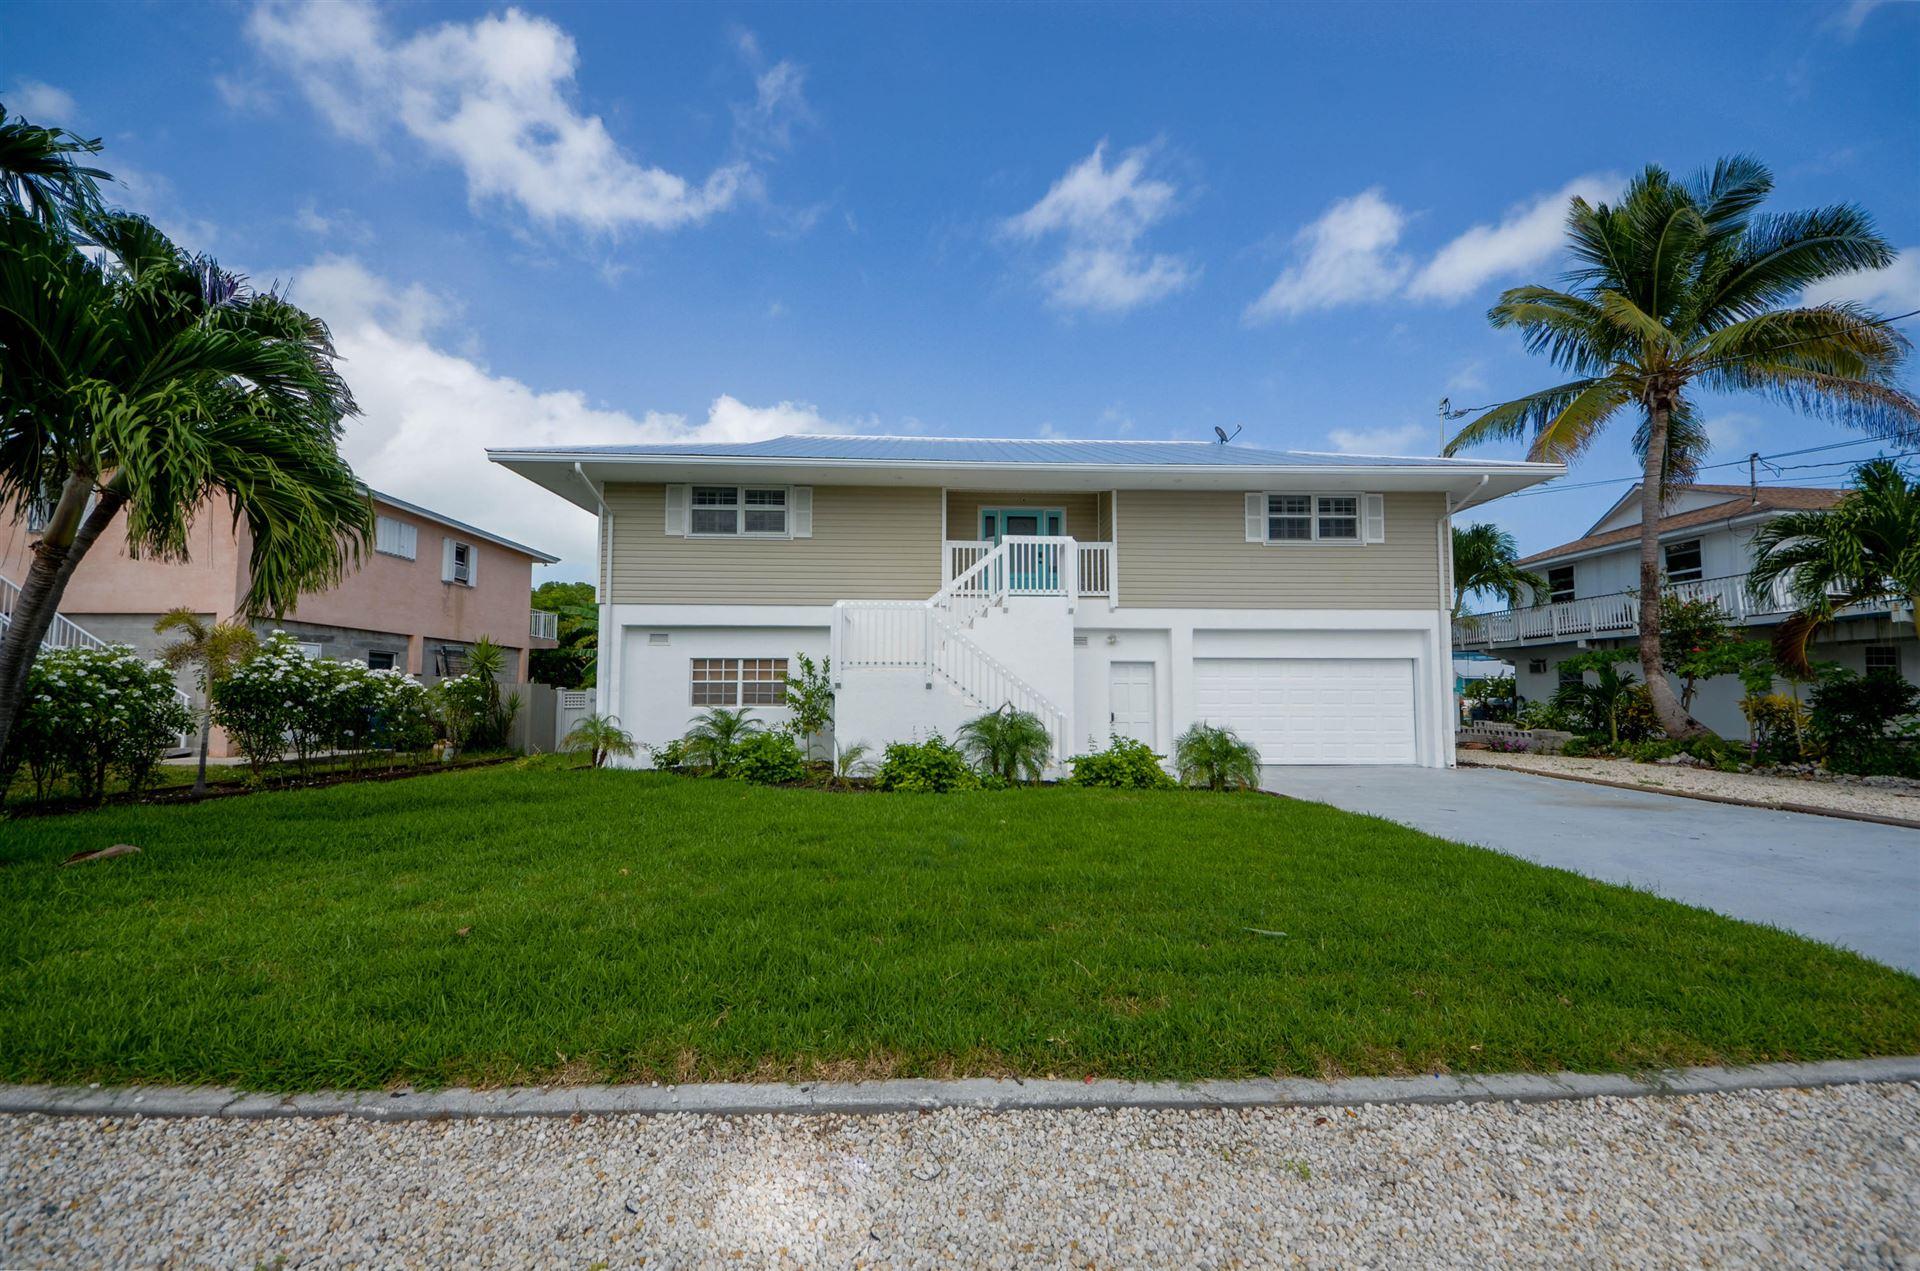 9 Emerald Drive, Key West, FL 33040 - #: 592338